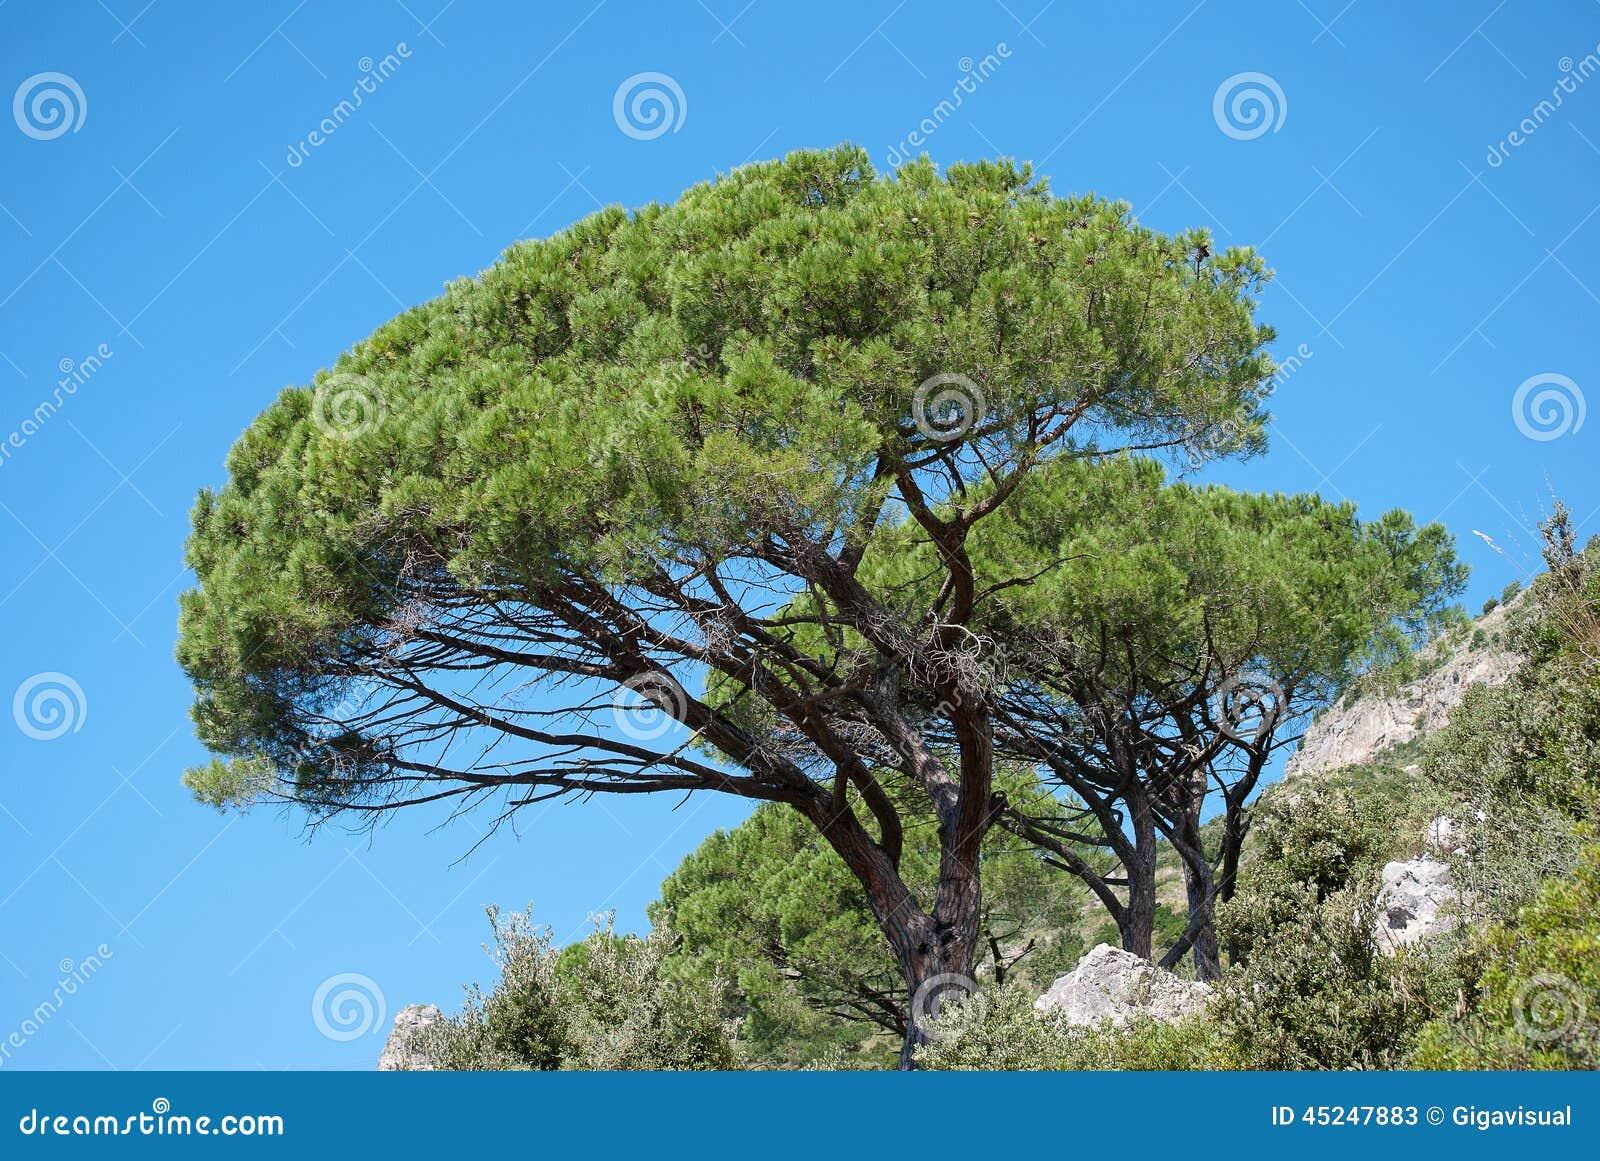 Mediterranean Pine Trees Stock Photo - Image: 45247883